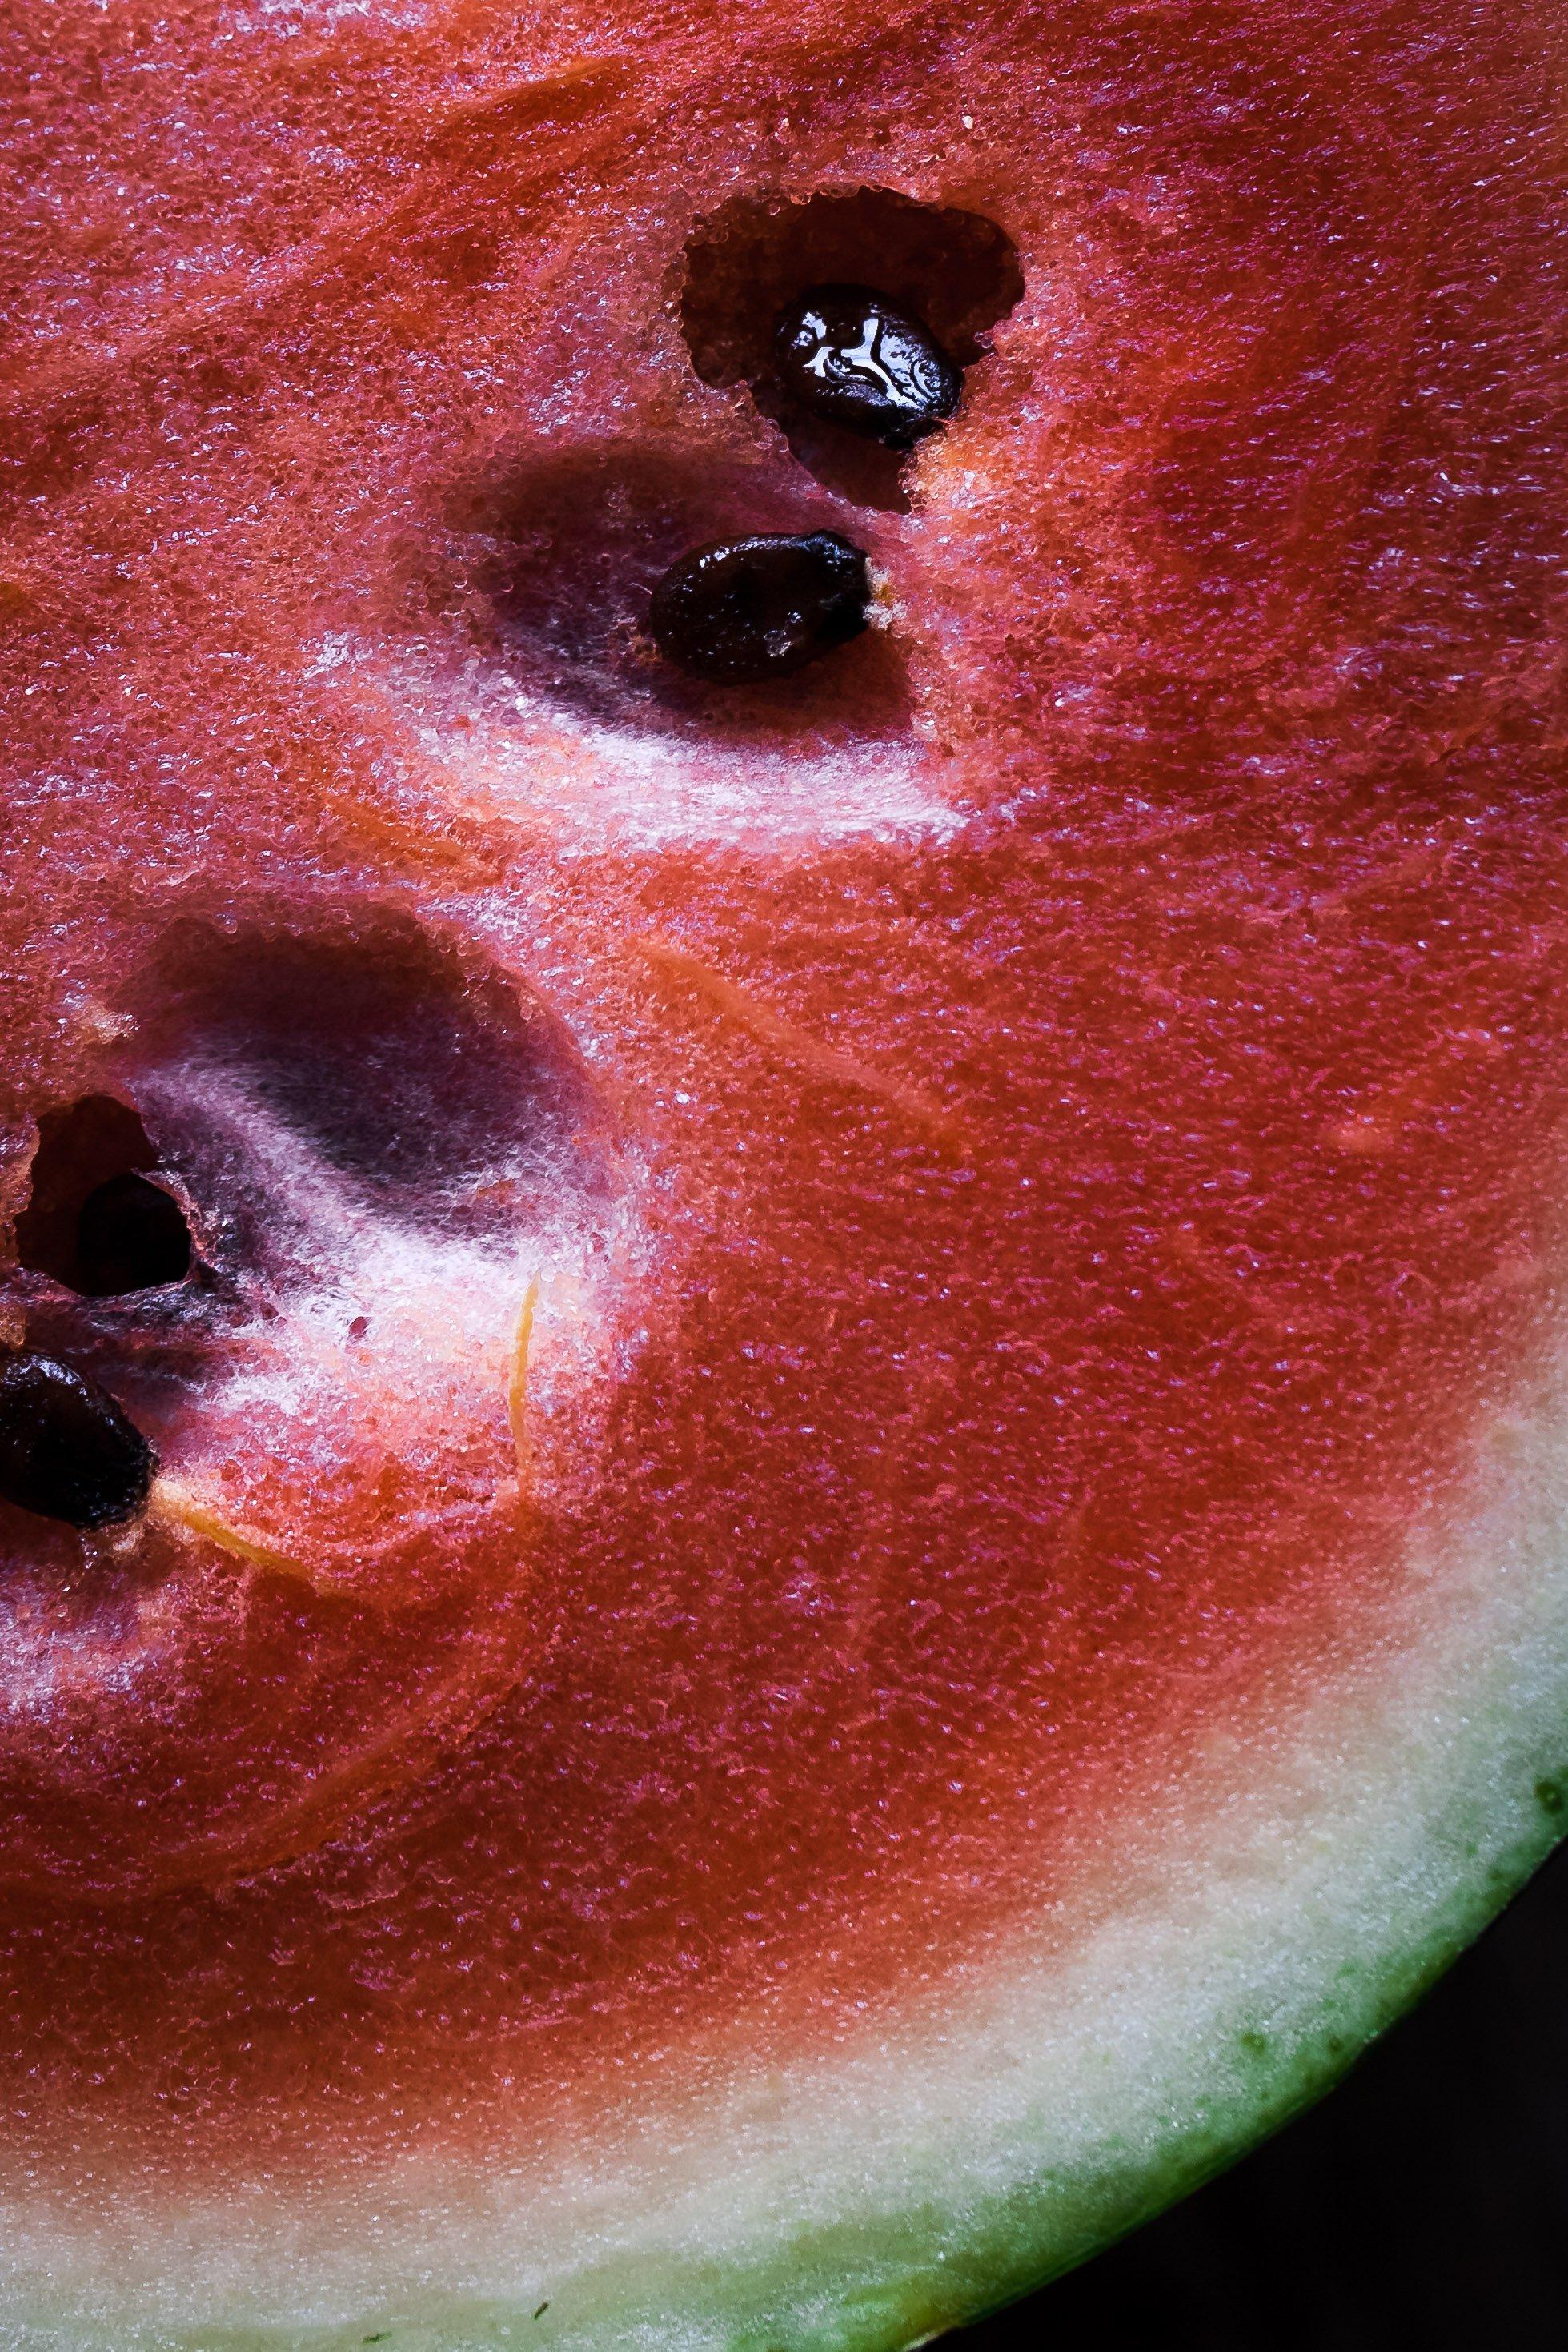 overhead closeup view of a watermelon slice.